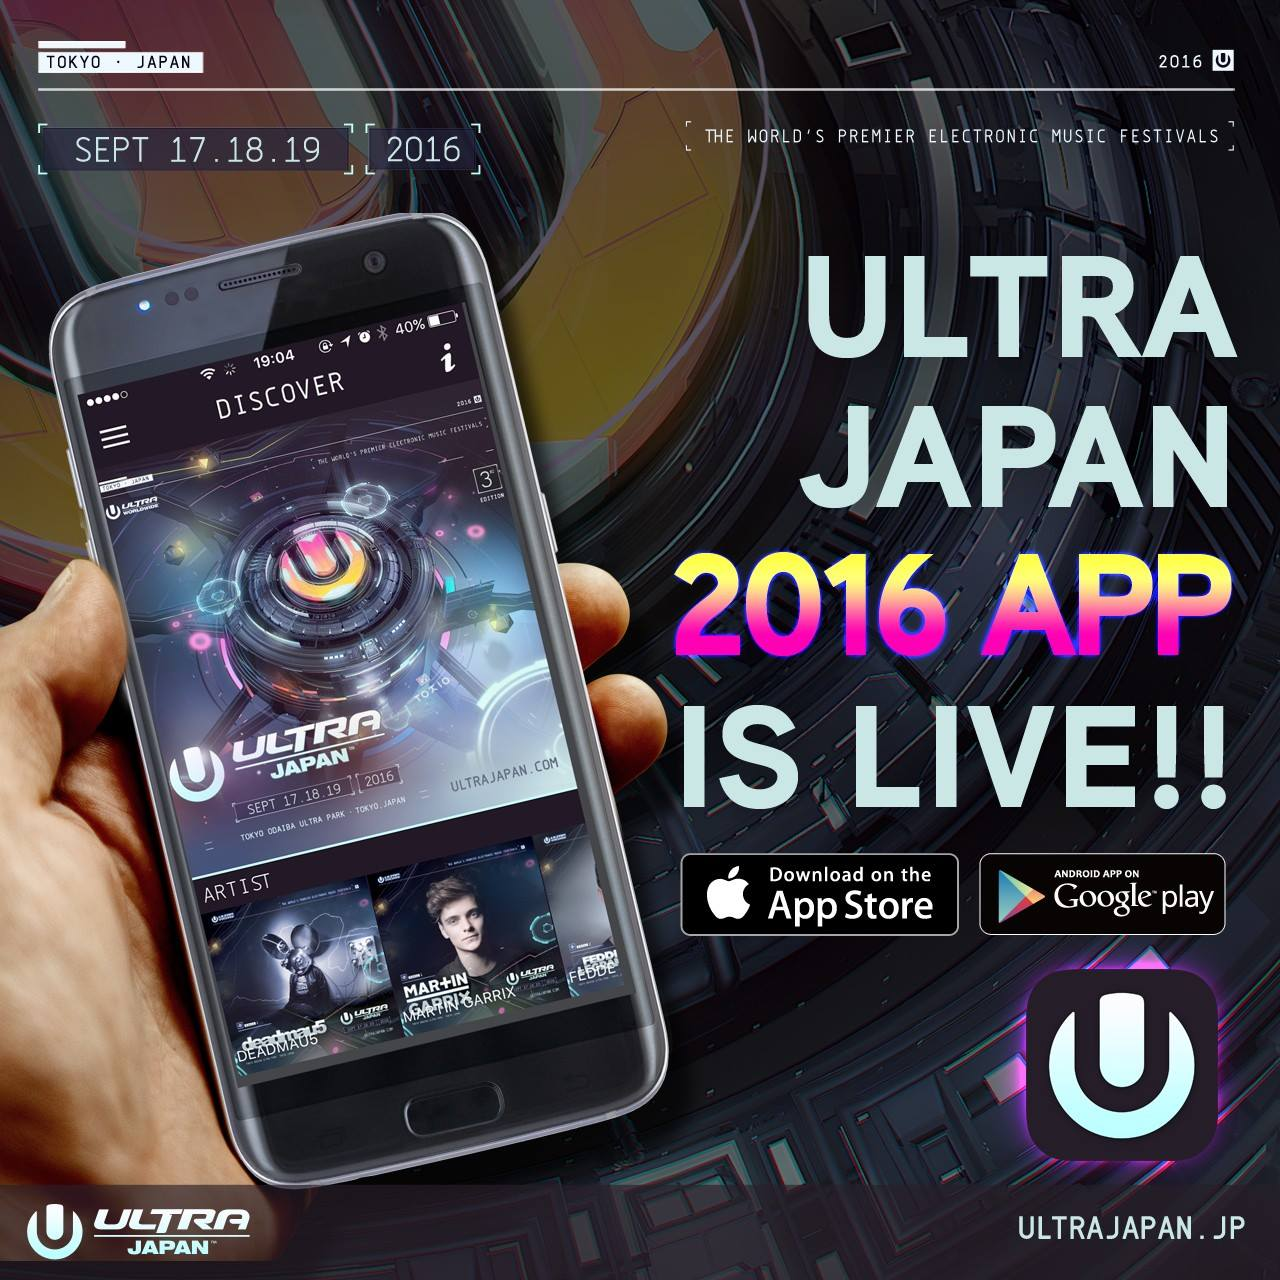 ultra-japan-2016-app-is-live